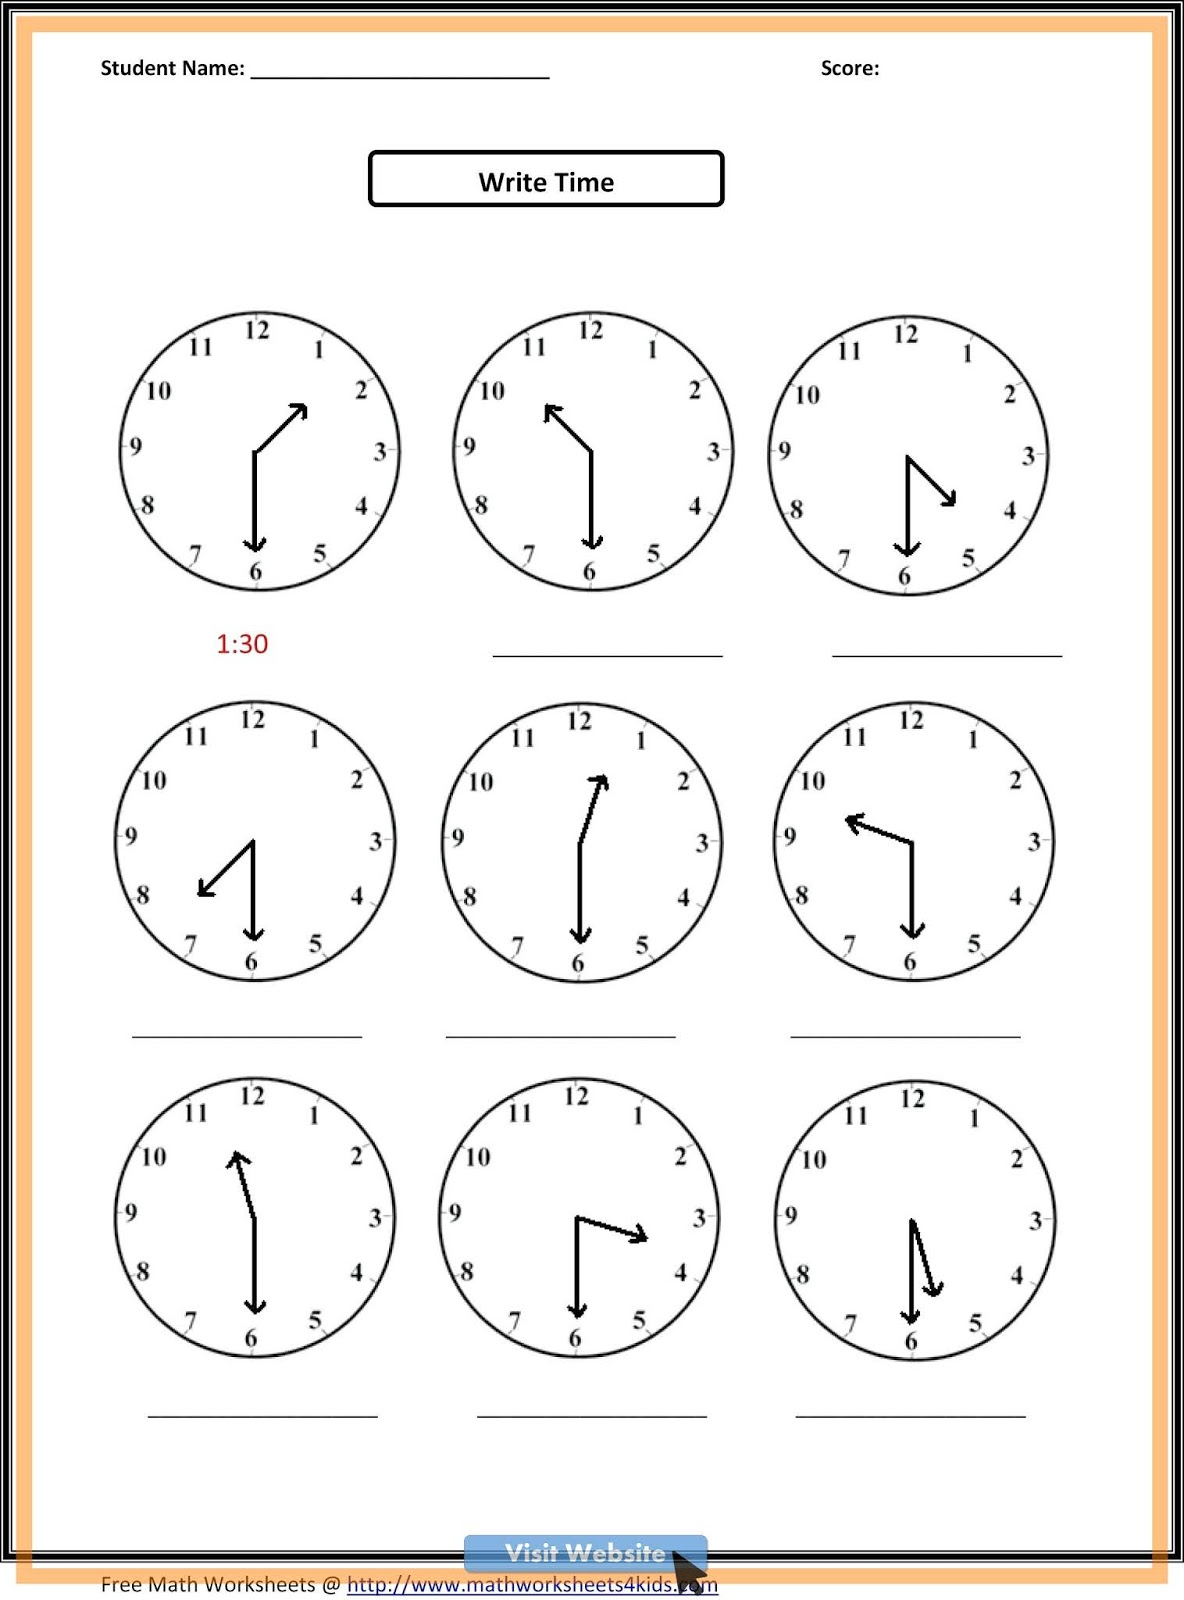 medium resolution of 3rd grade math worksheets word problems free printable